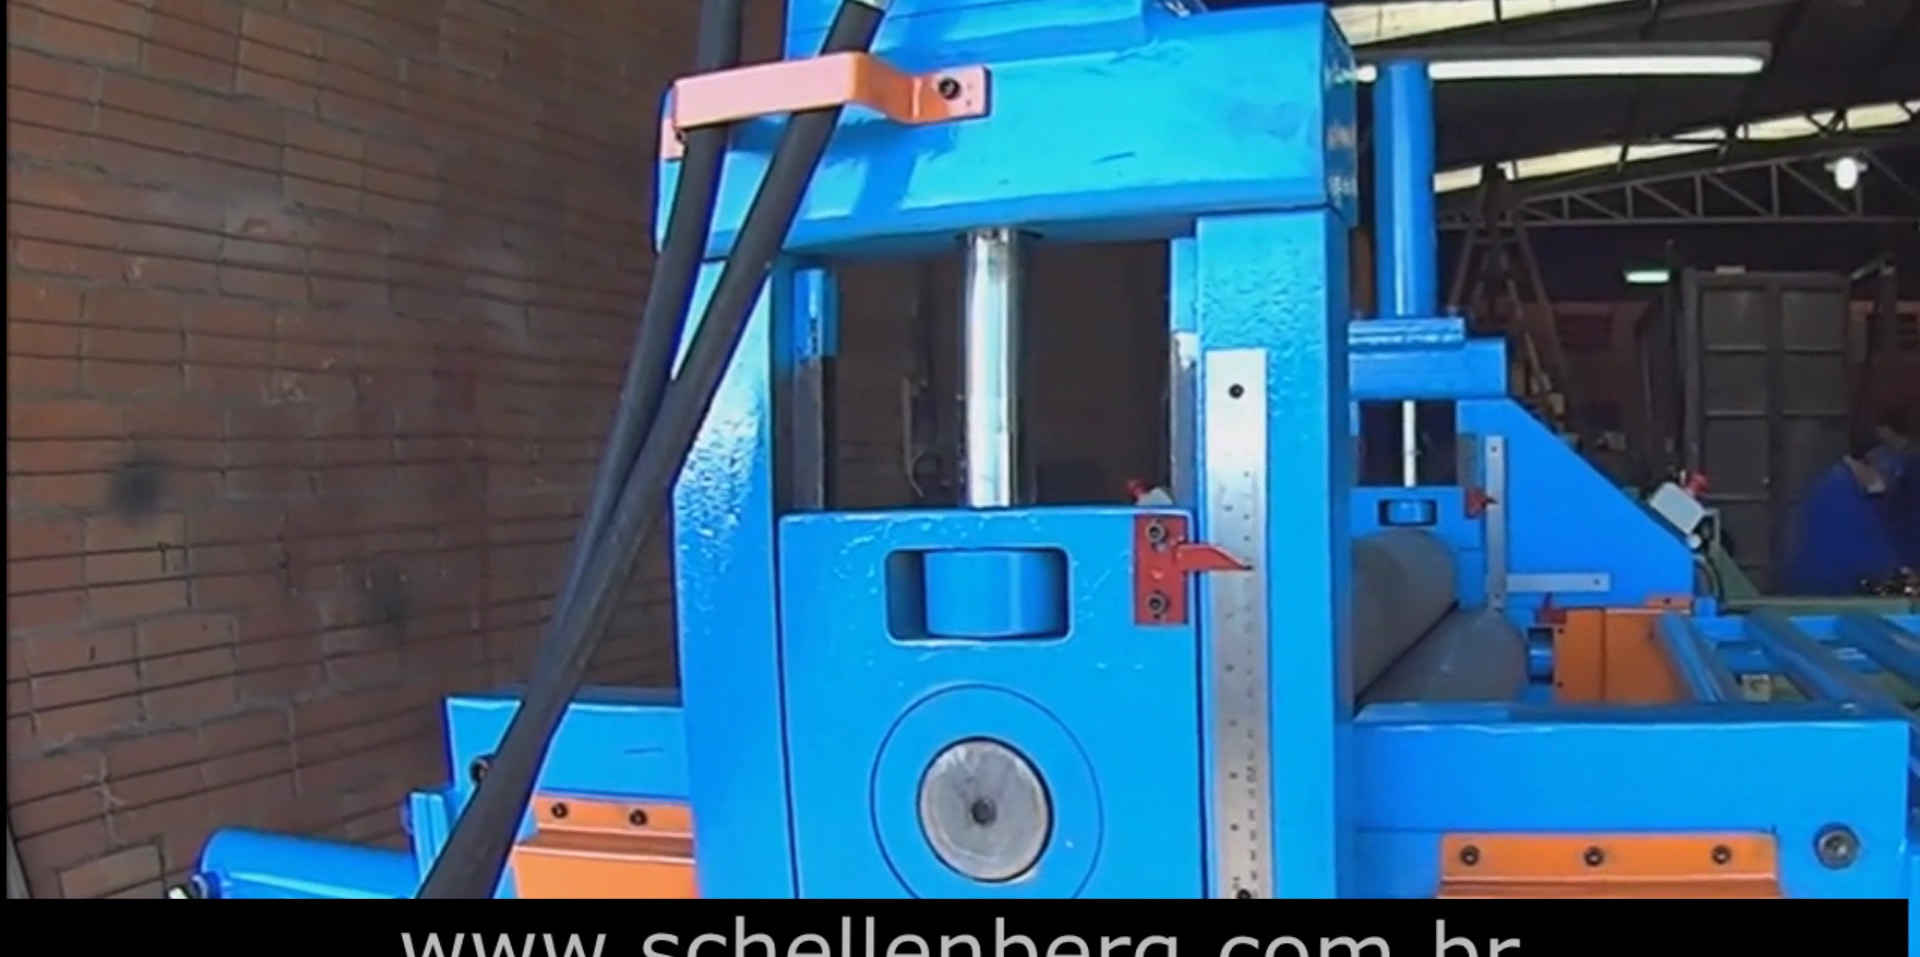 Calandra Hidráulica para Chapas de Aço 13 x 1550 mm